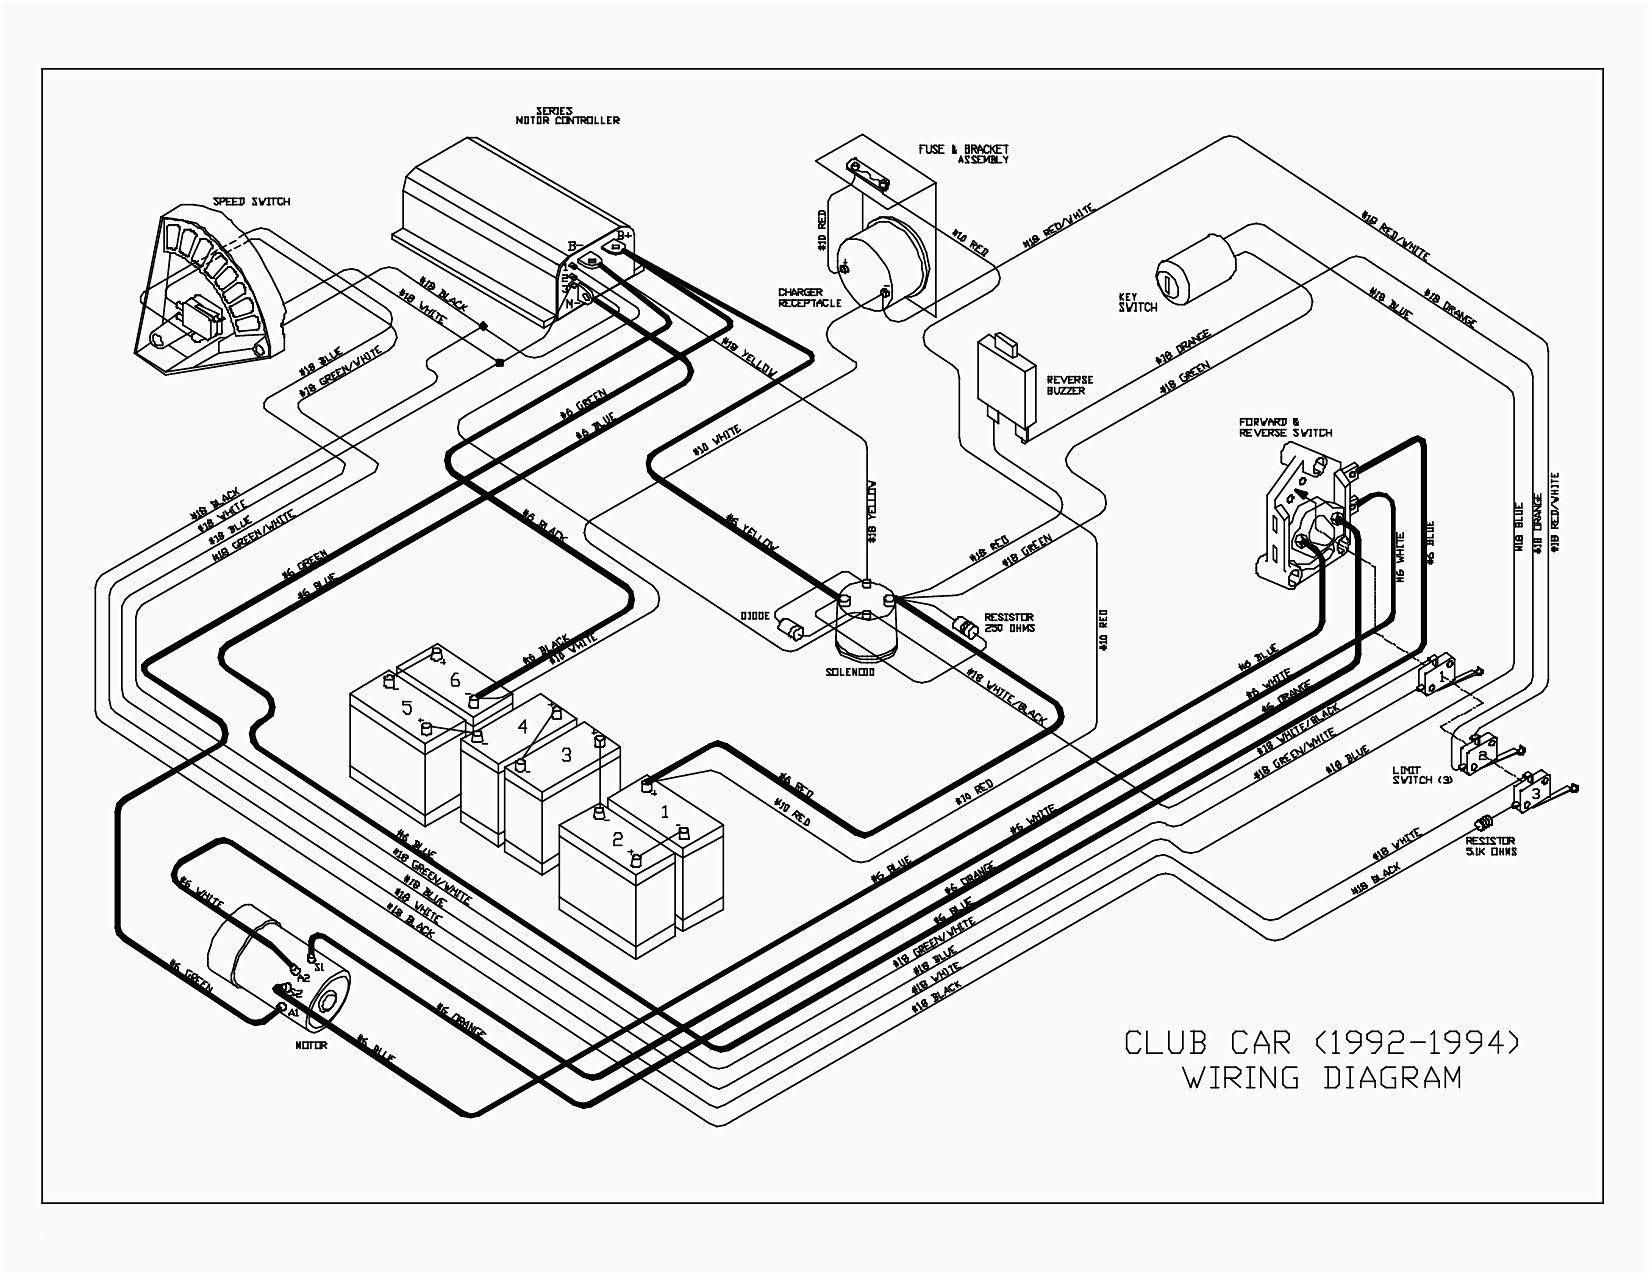 Wiring Diagram for Club Car Lights #diagram #diagramtemplate #diagramsample  | Motor eléctrico, Carrito de golf, Proyectos eléctricos | Club Car Light Wiring Diagram |  | Pinterest